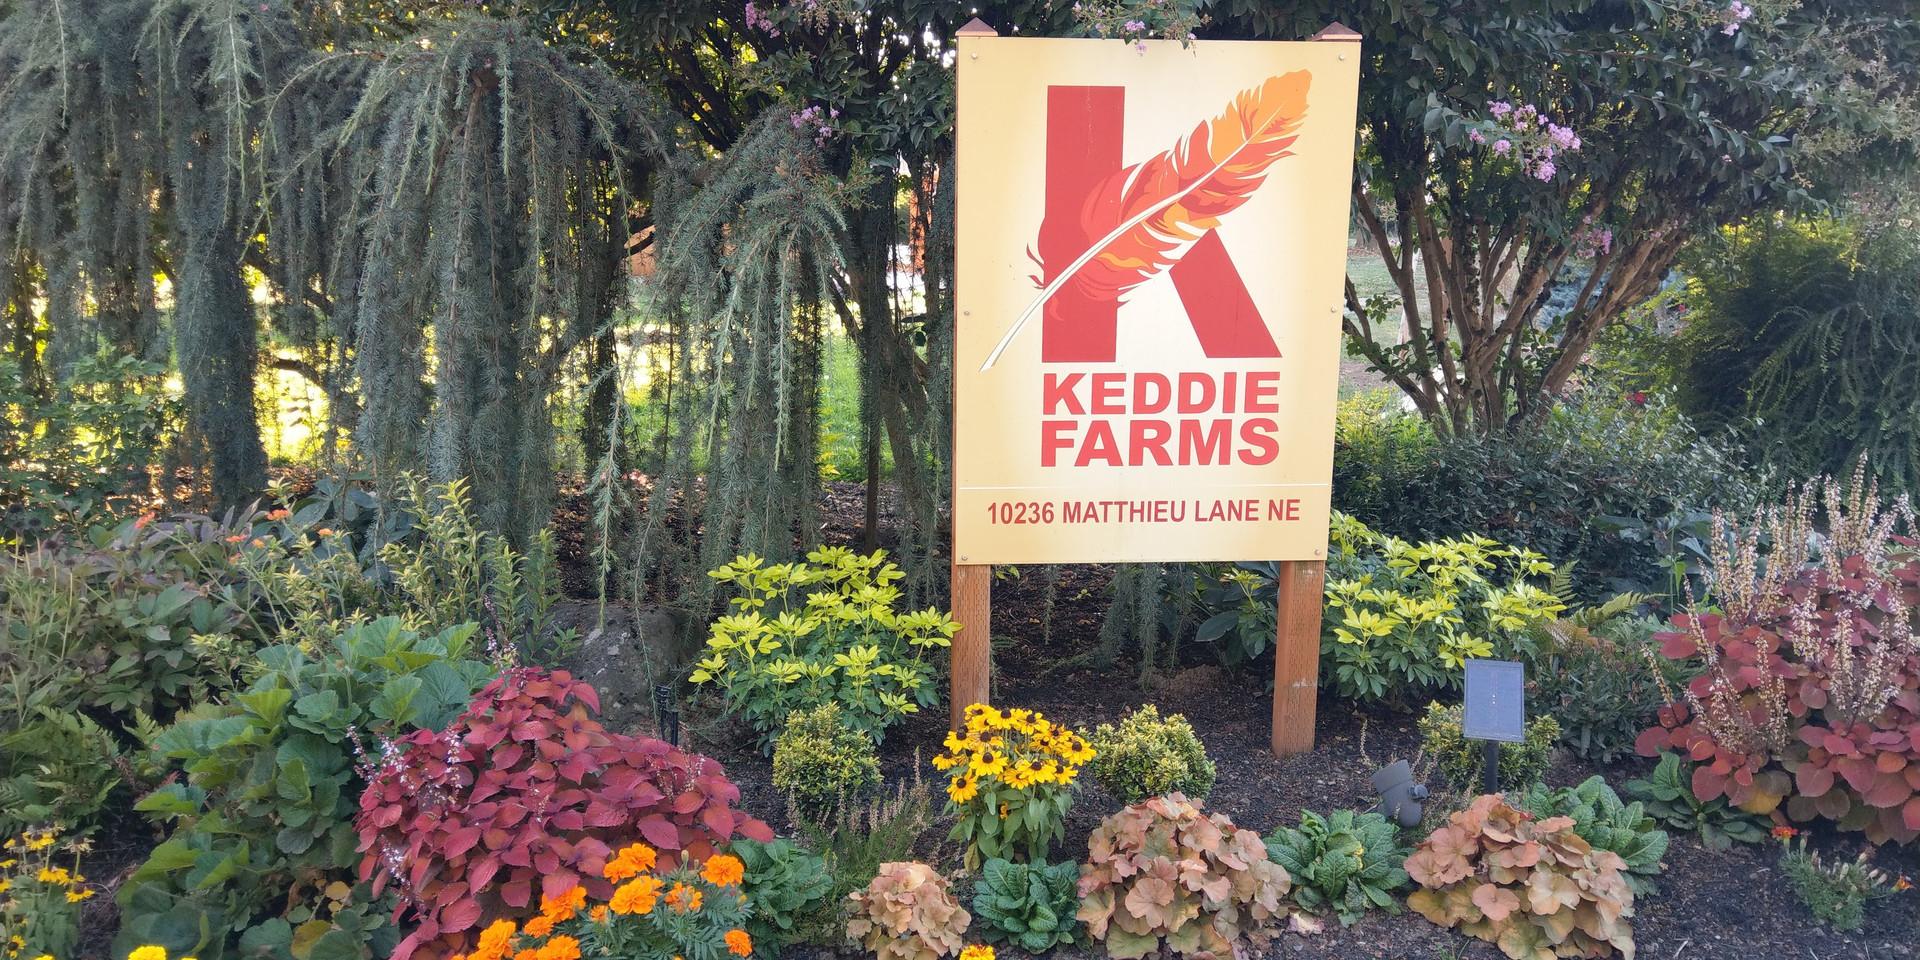 Keddie Farms